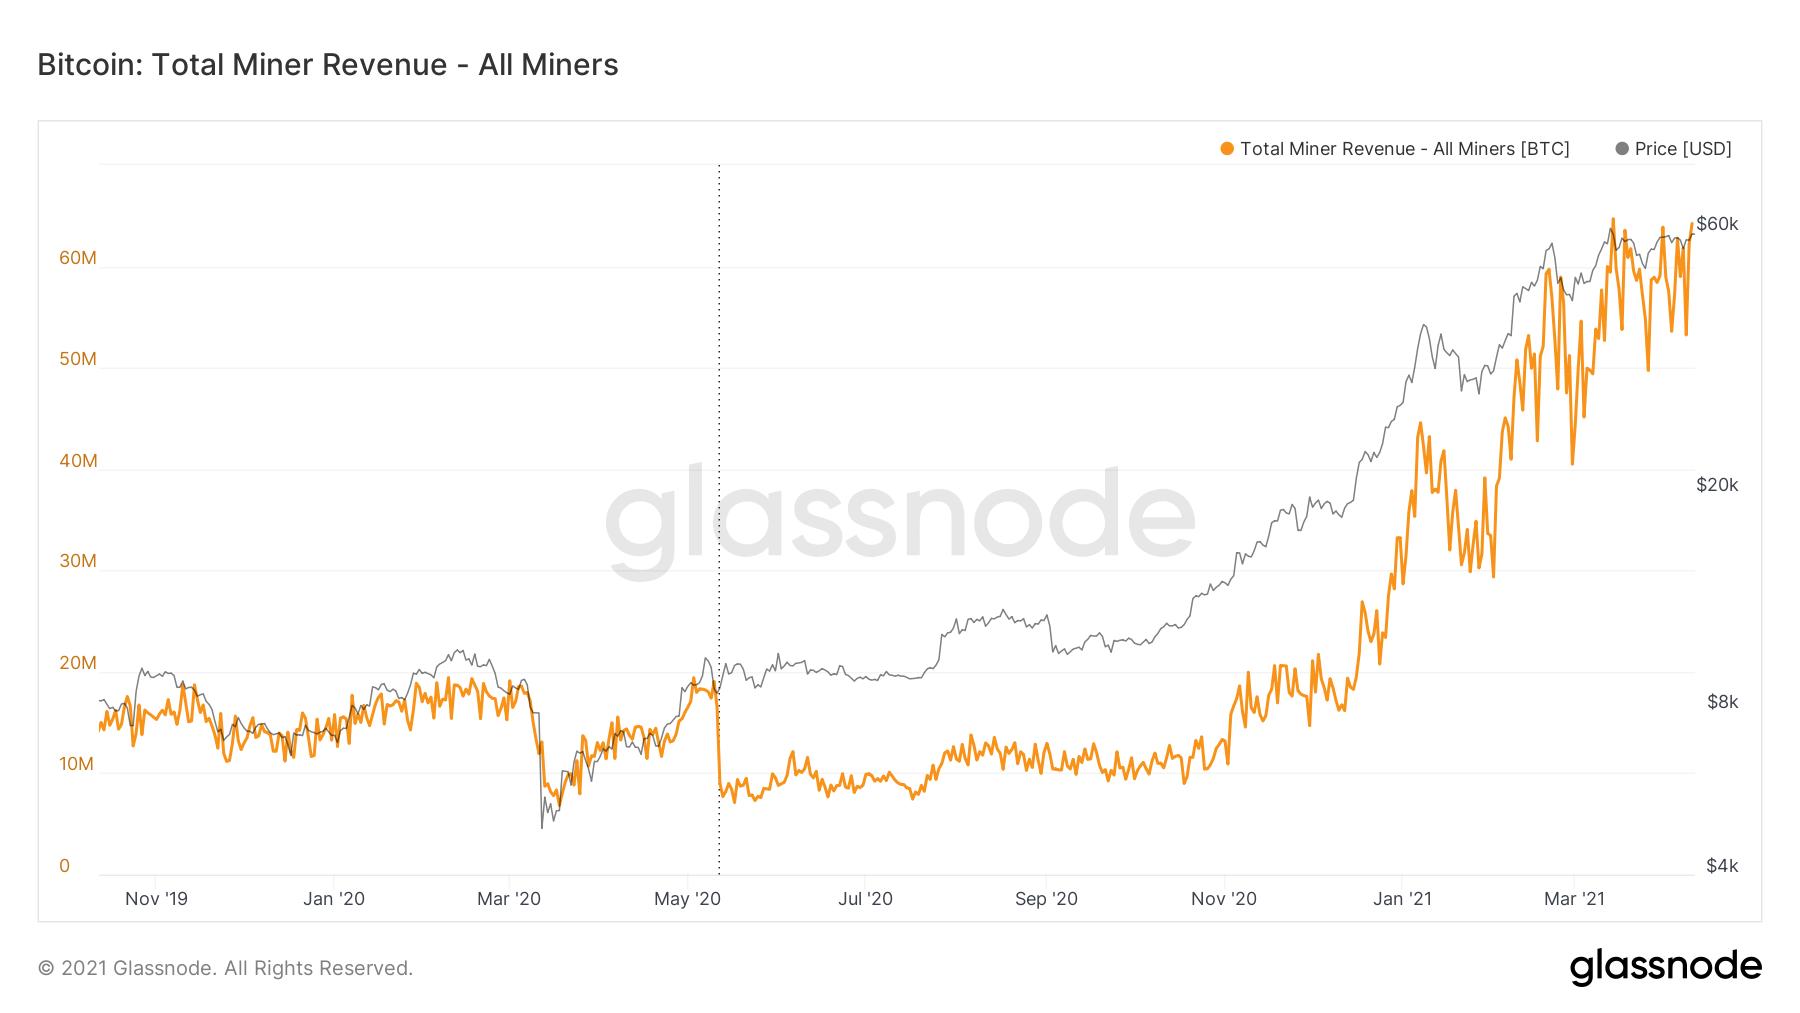 glassnode studio bitcoin total miner revenue all miners 1